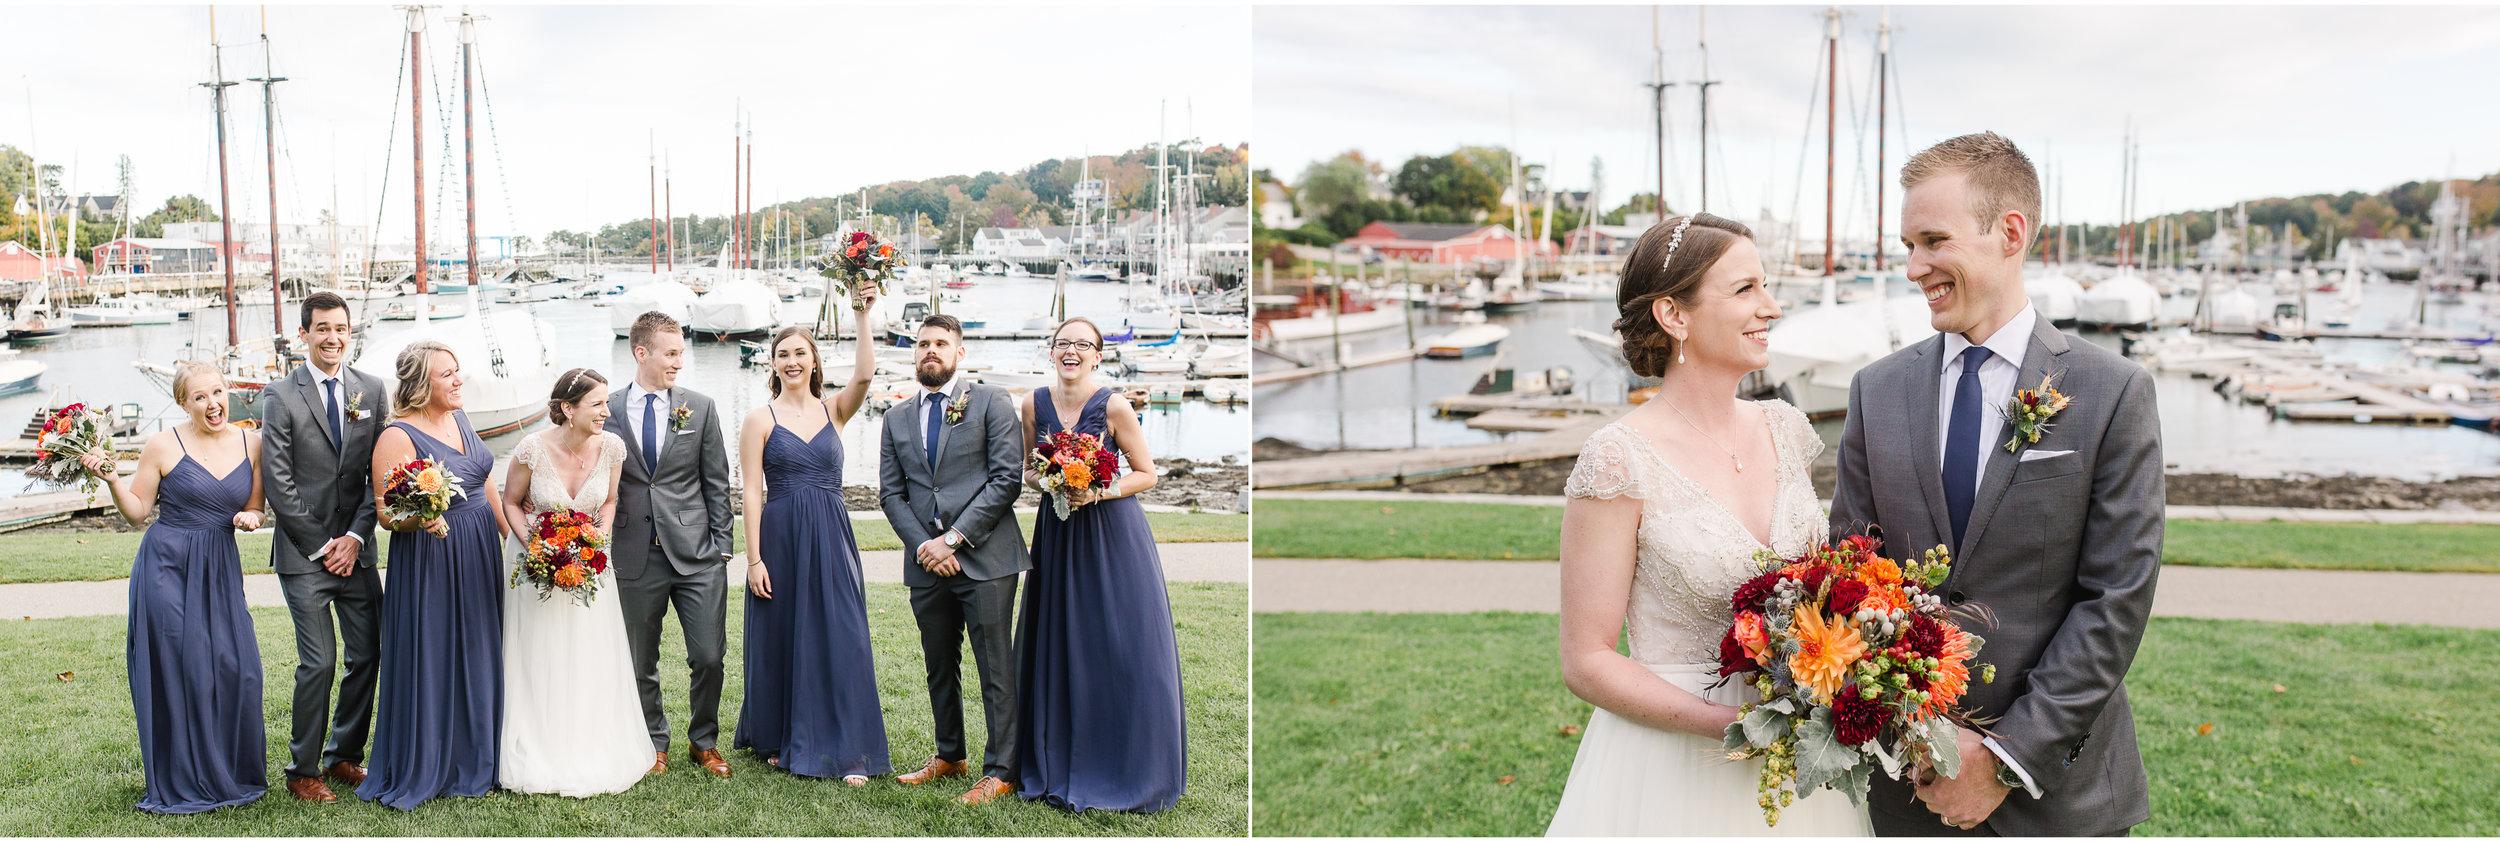 Camden Maine Wedding 13.jpg